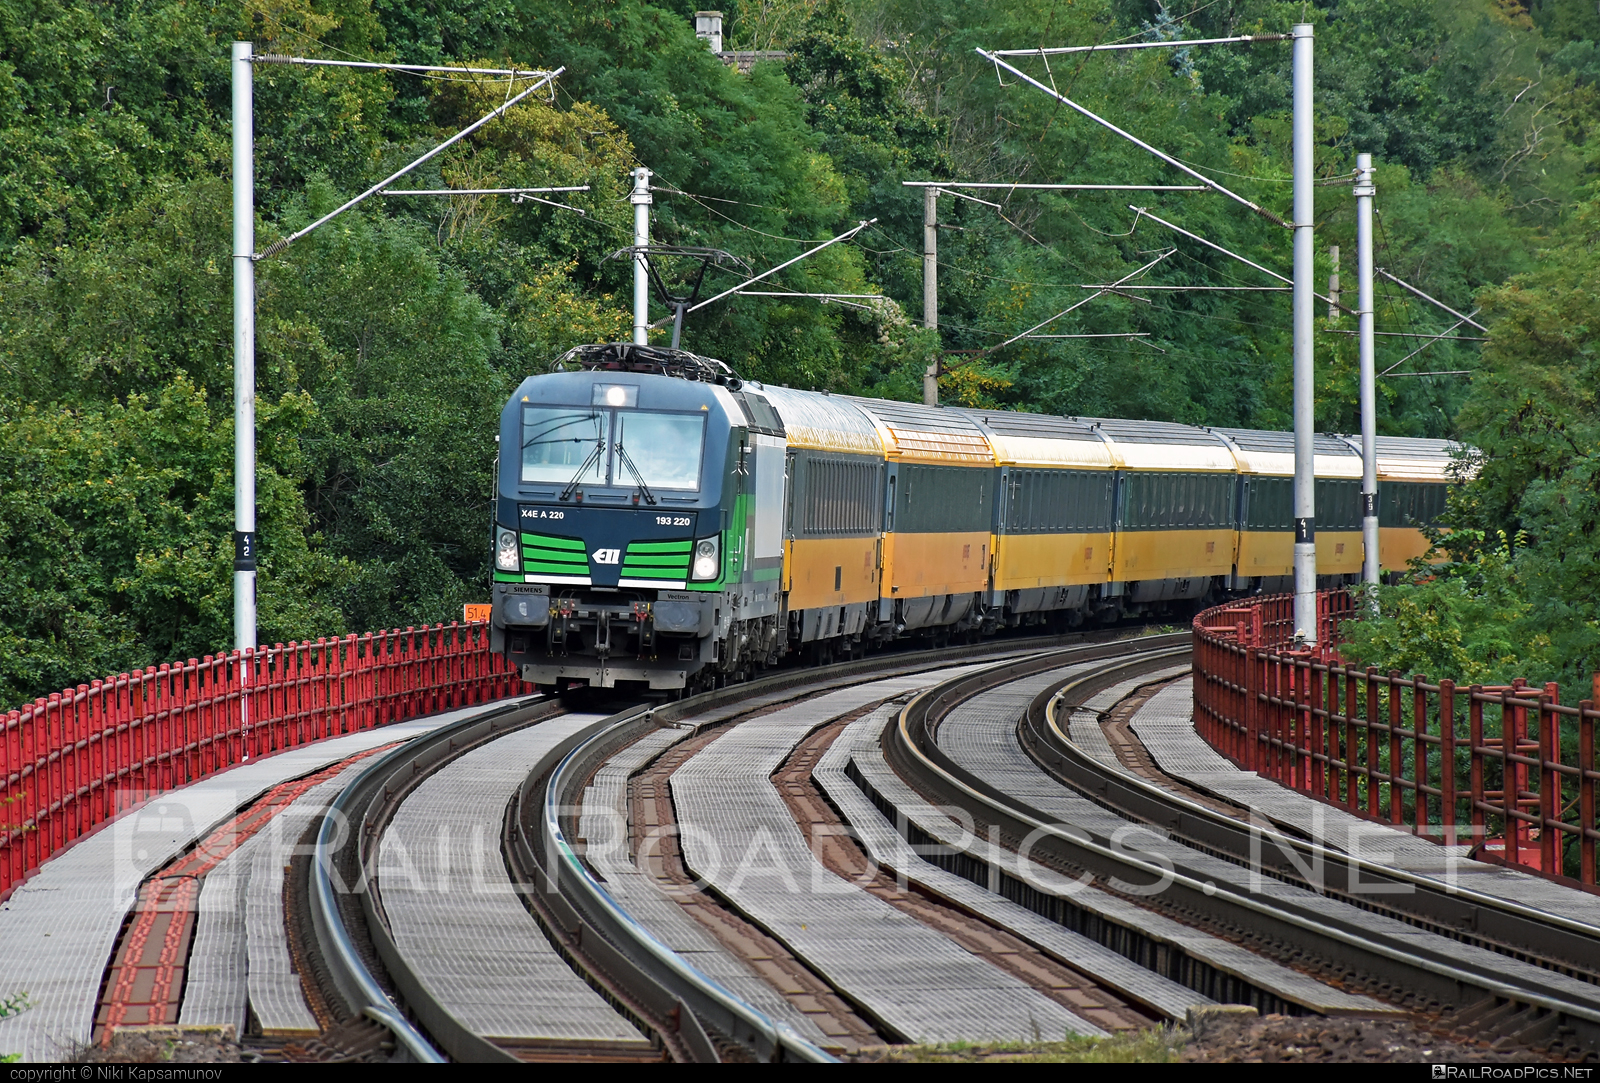 Siemens Vectron MS - 193 220 operated by RegioJet, a.s. #ell #ellgermany #eloc #europeanlocomotiveleasing #regiojet #siemens #siemensvectron #siemensvectronms #vectron #vectronms